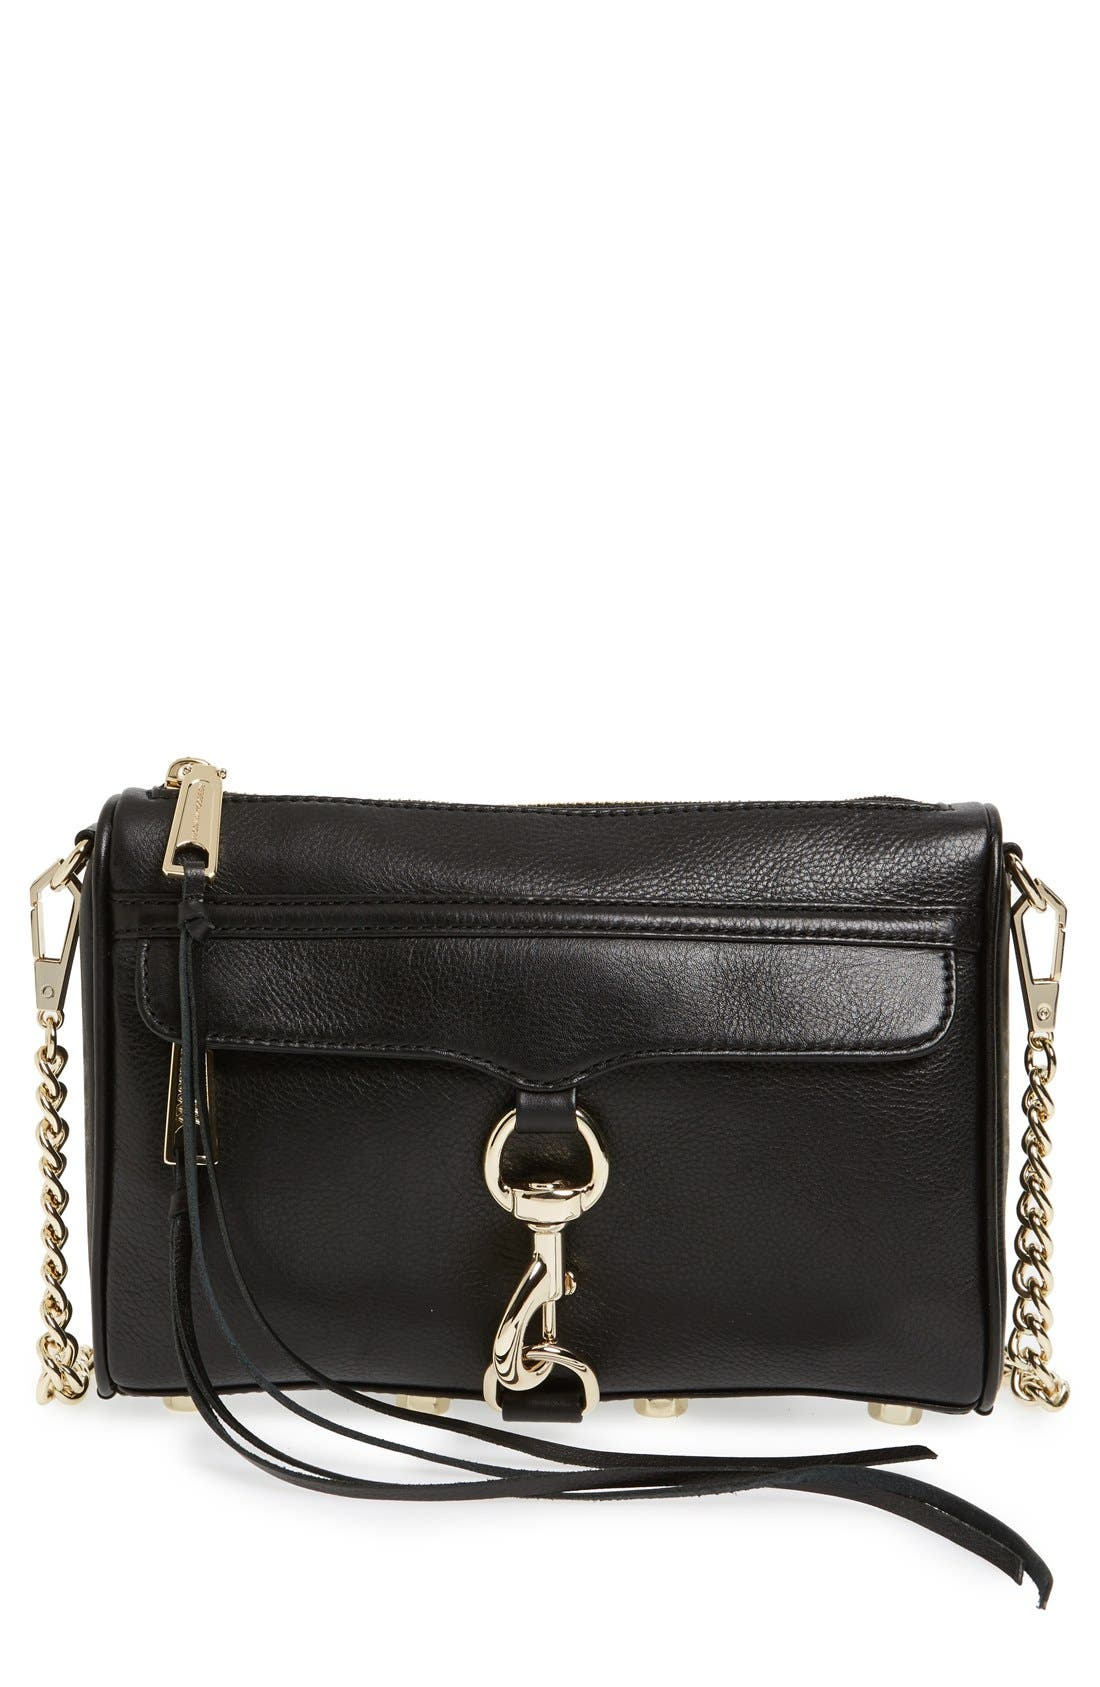 Mini MAC Convertible Crossbody Bag,                             Main thumbnail 1, color,                             BLACK LEATHER/ LT GOLD HRDWR